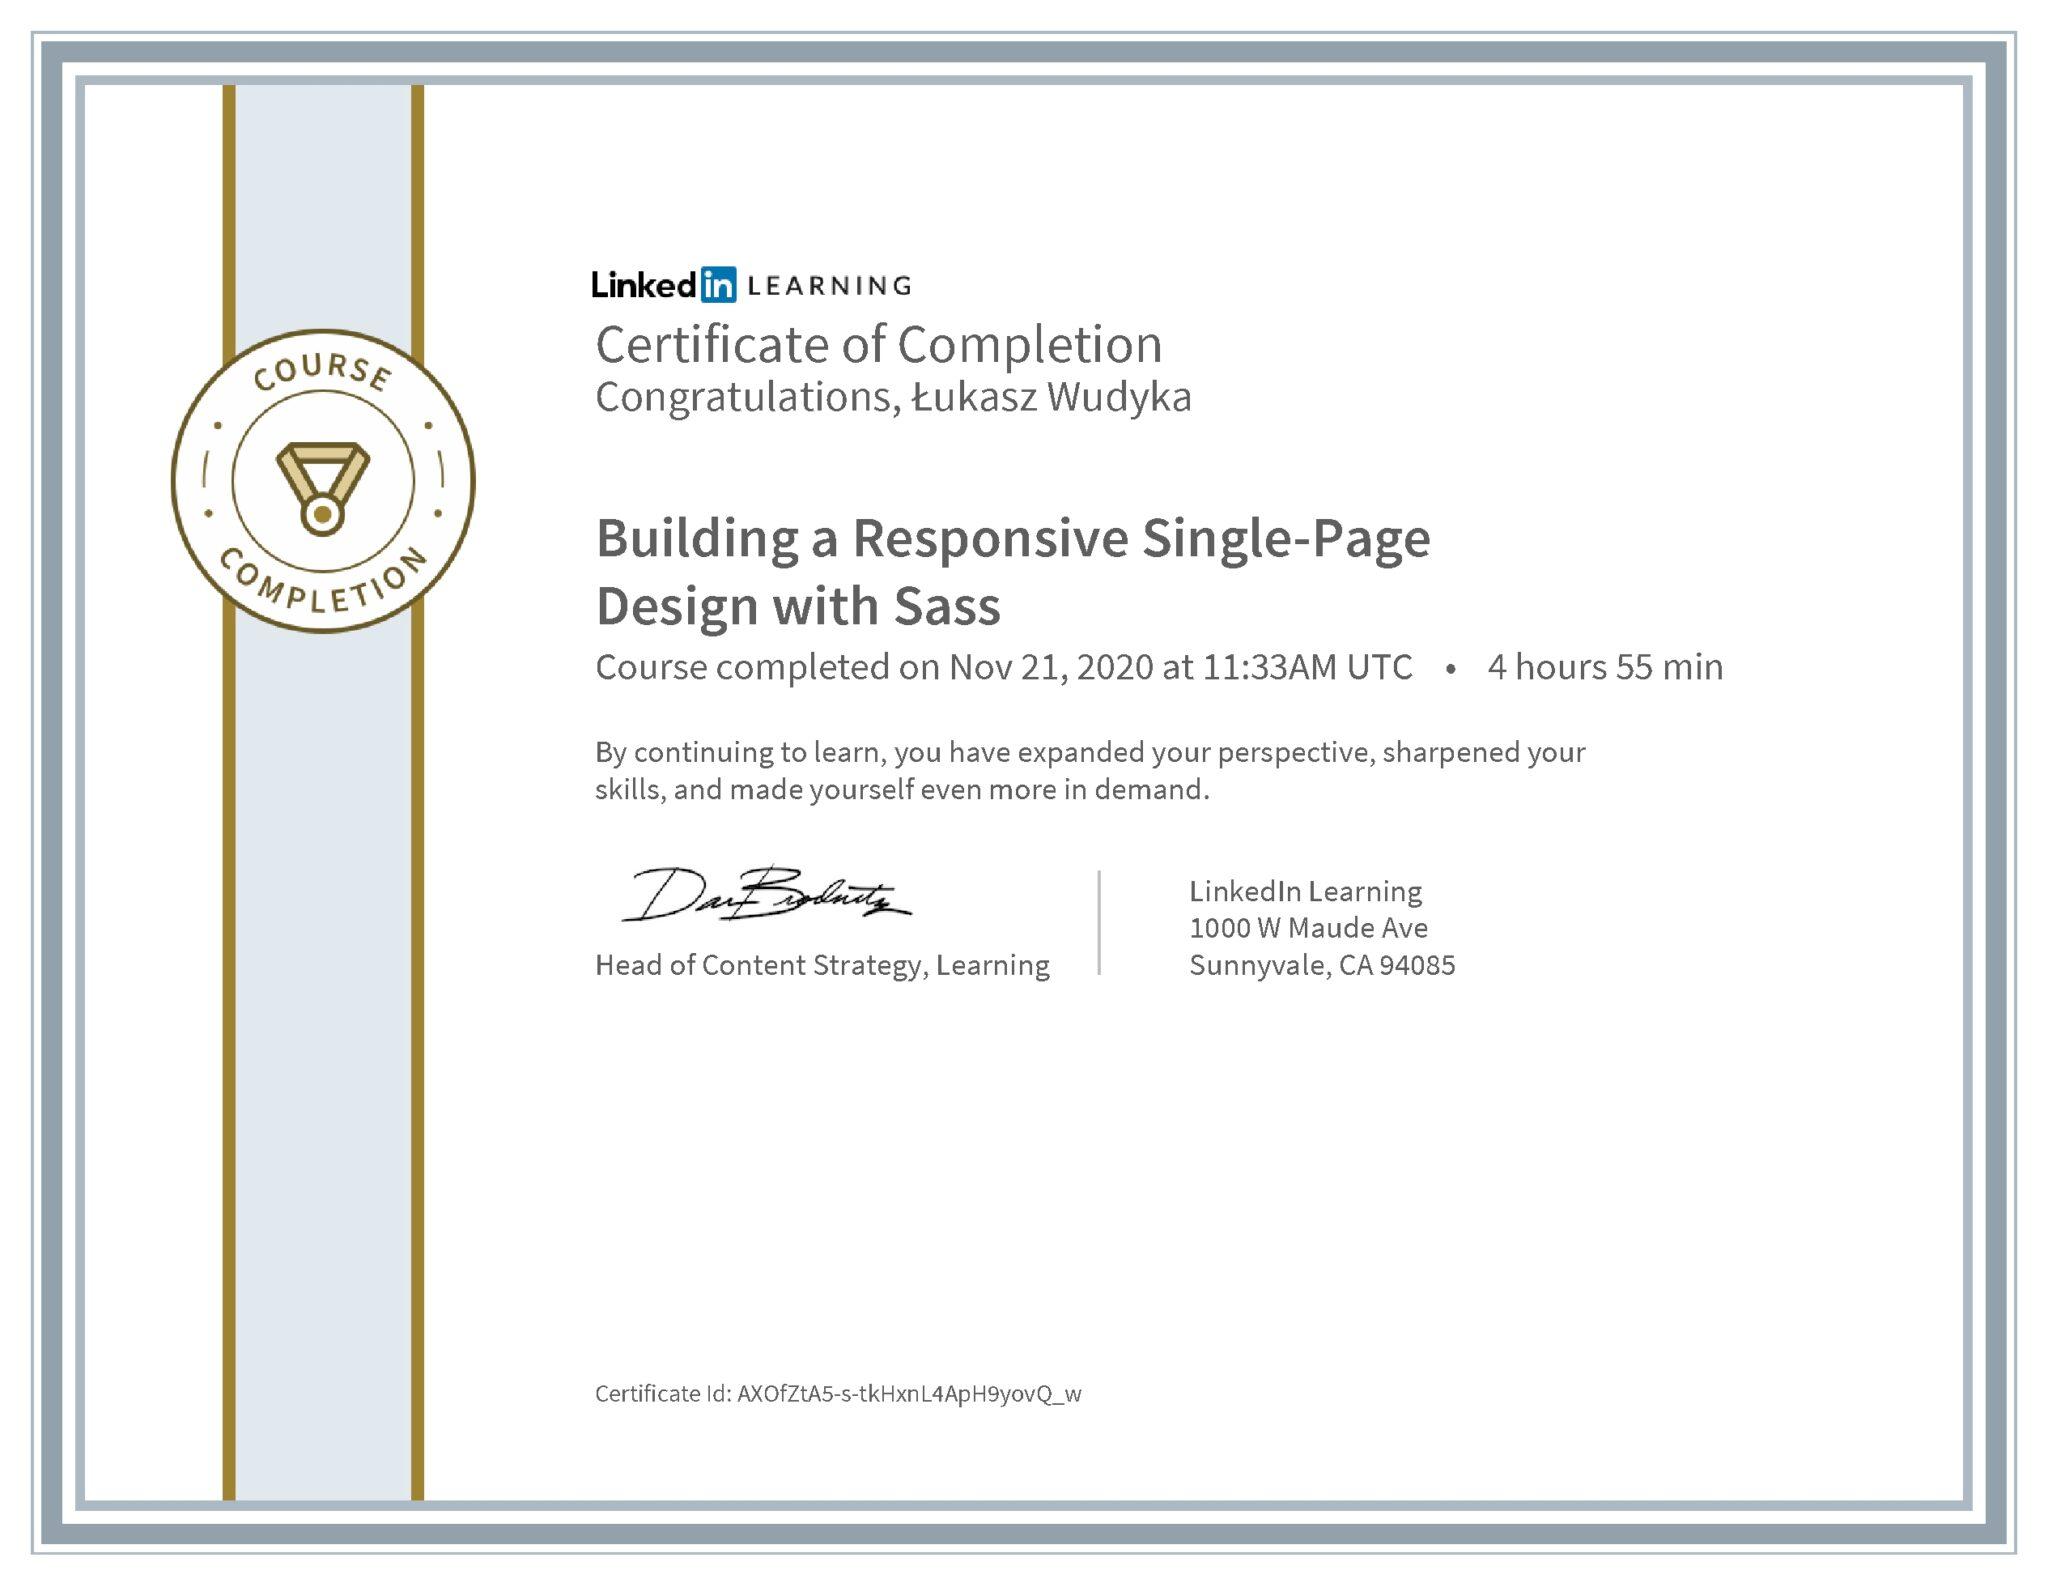 Łukasz Wudyka certyfikat LinkedIn Building a Responsive Single-Page Design with Sass